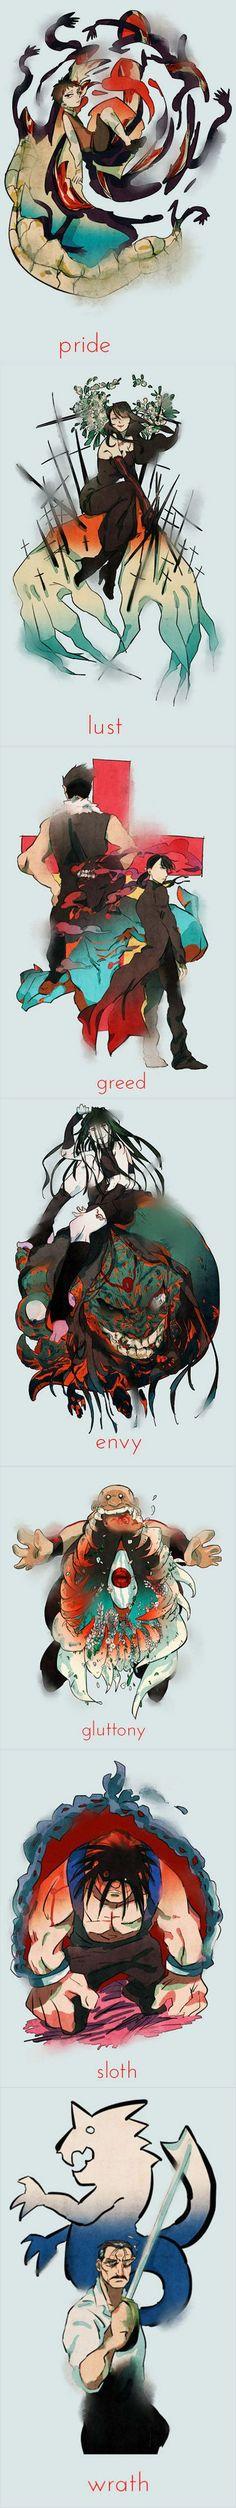 Fullmetal Alchemist - the Seven Deadly Sins - homunculi: